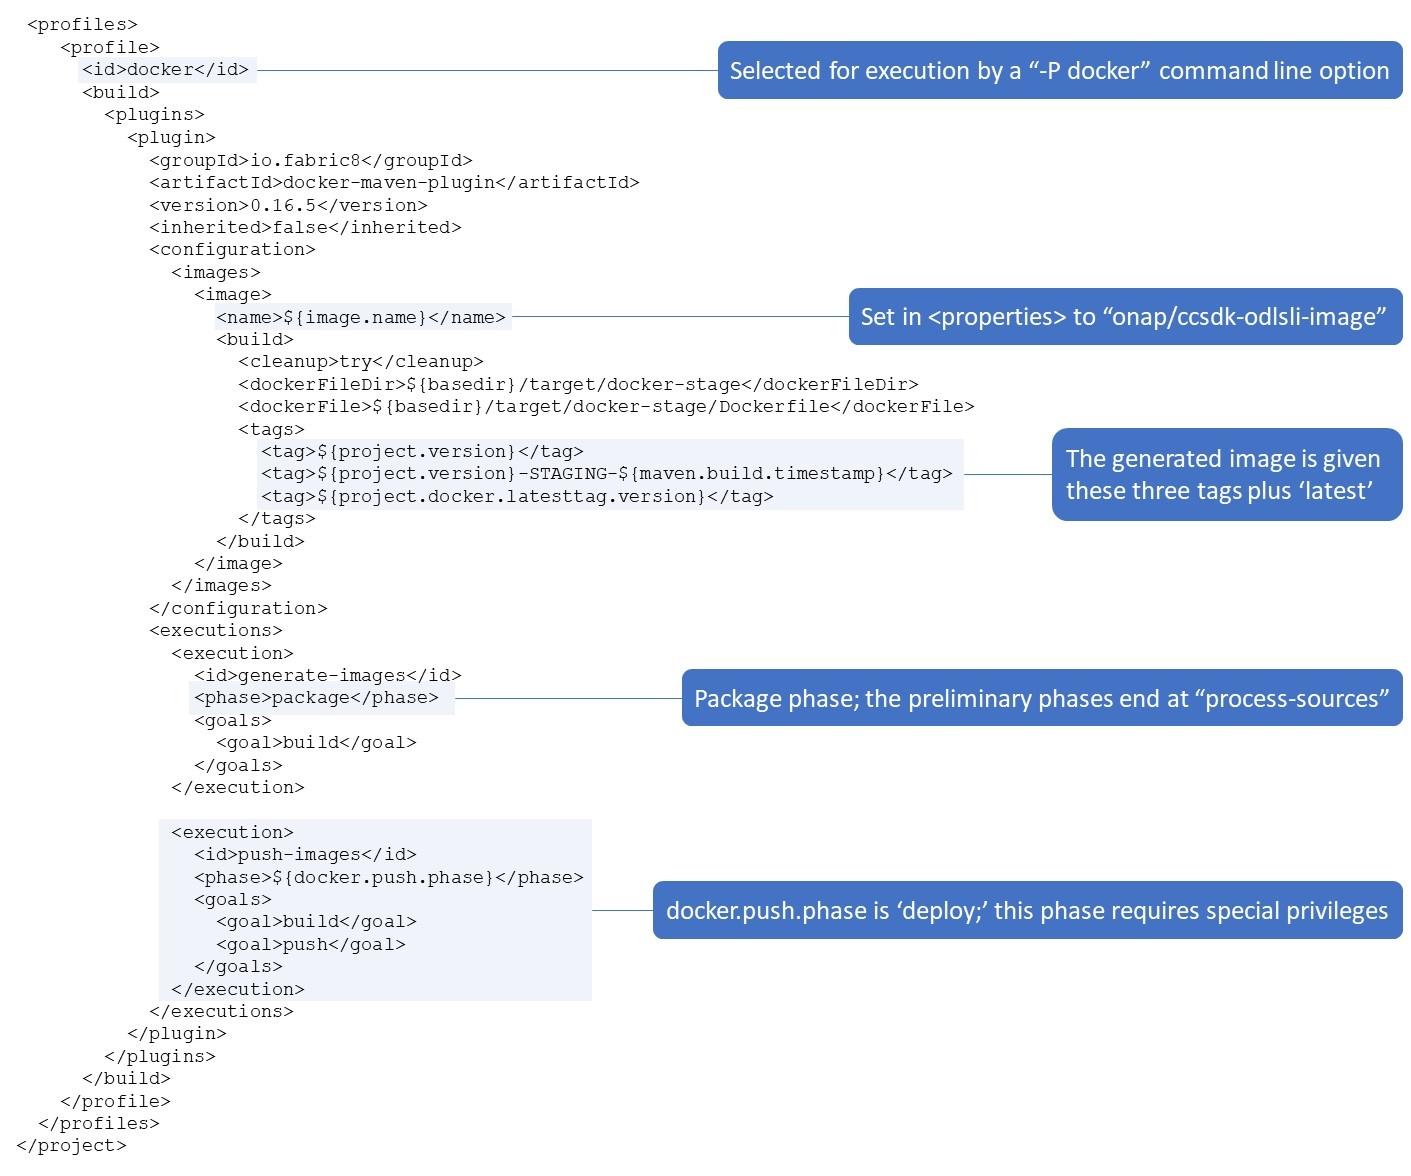 Creating an Instance of SDN-R (Casablanca) - Developer Wiki - Confluence